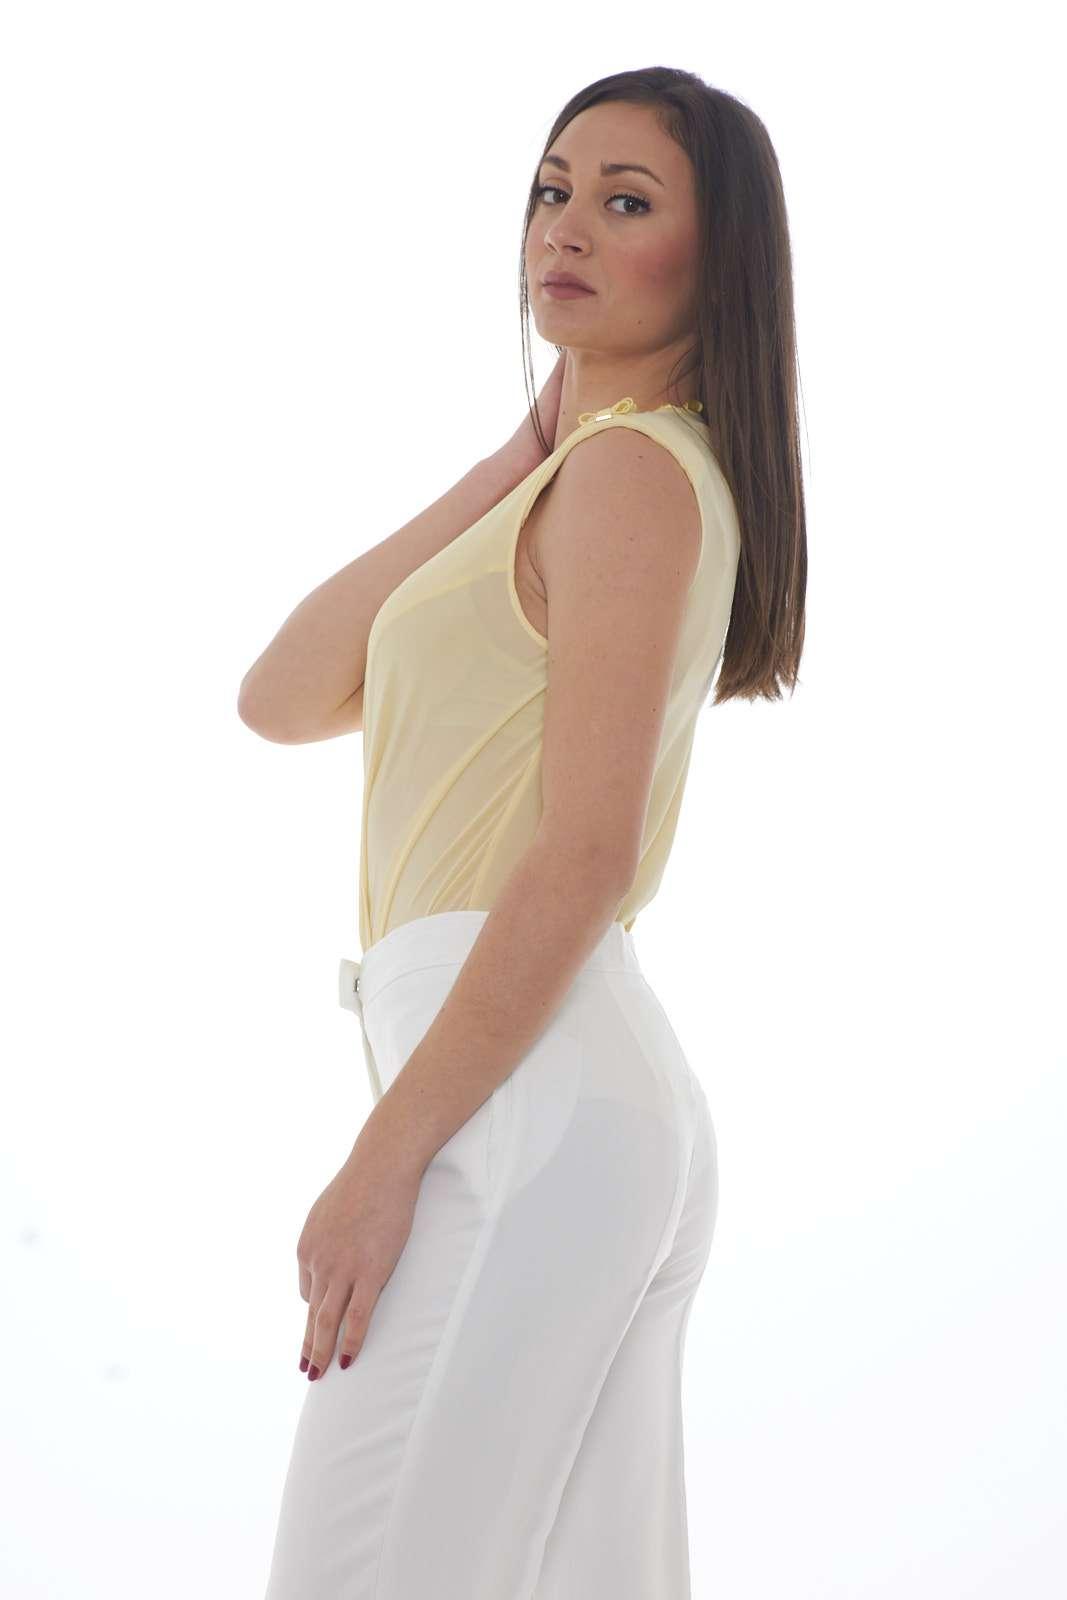 https://www.parmax.com/media/catalog/product/a/i/PE-outlet_parmax-body-donna-Elisabetta-Franchi-bo07481e2-B.jpg